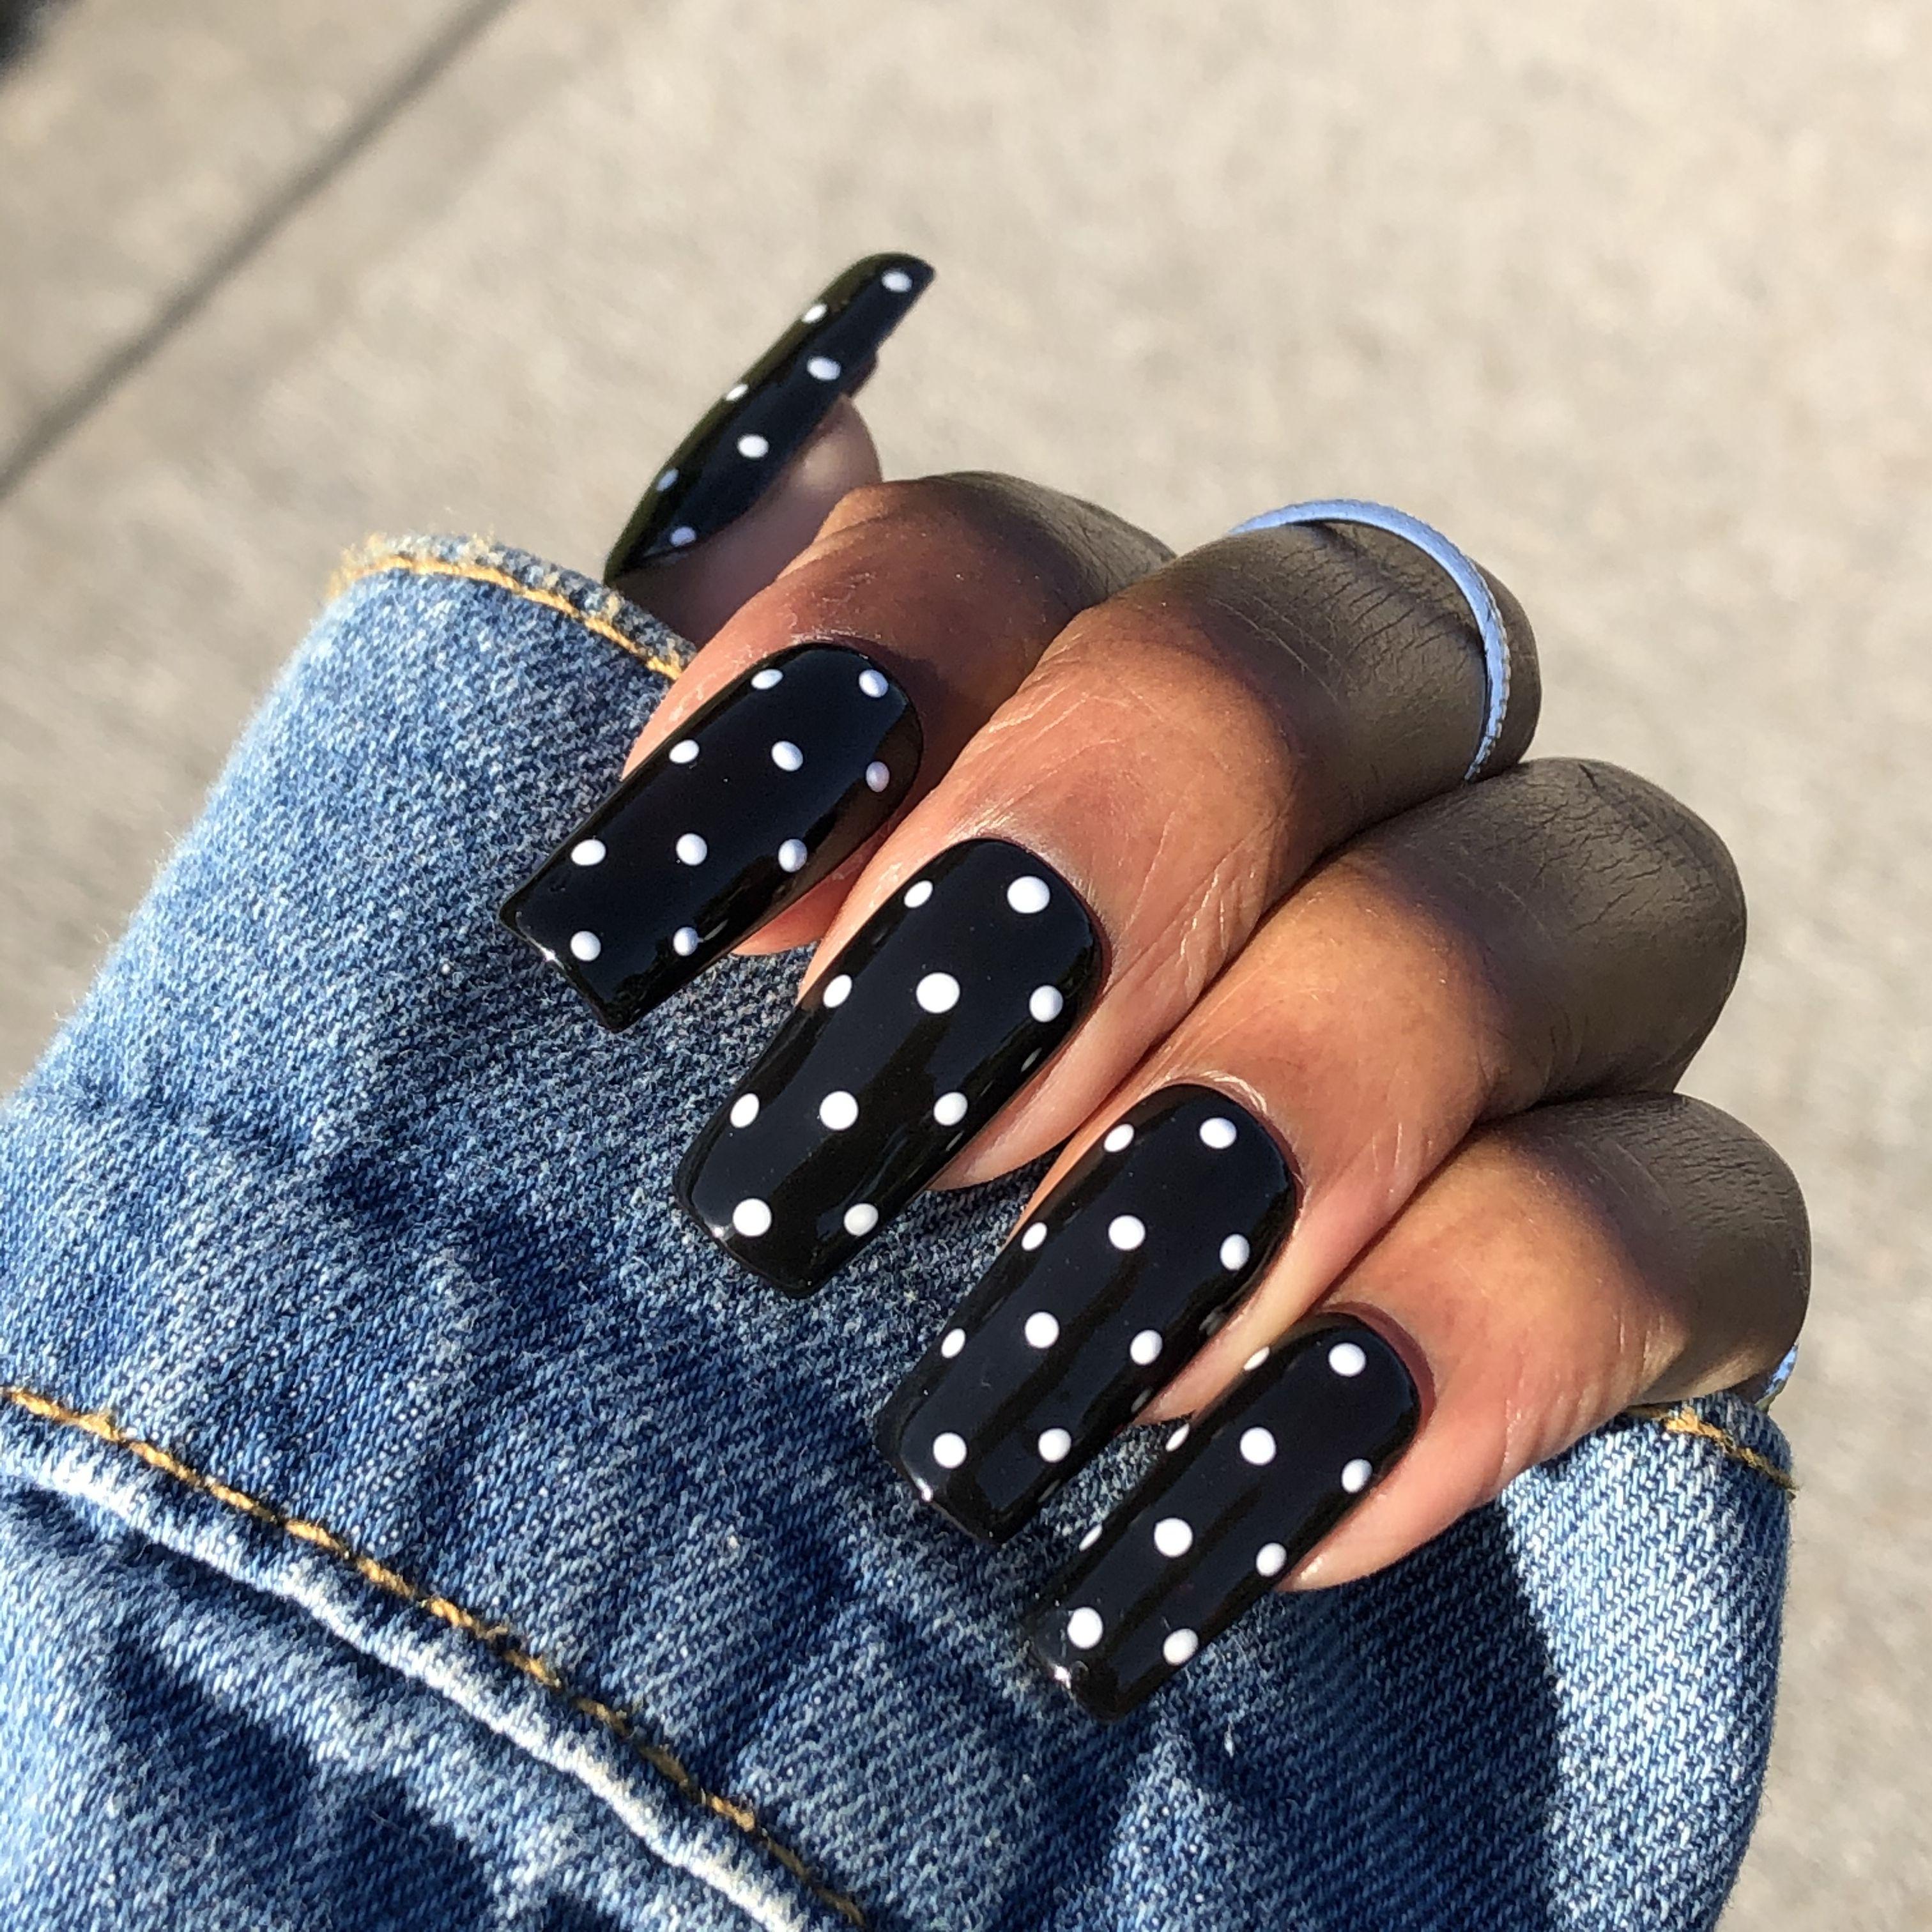 Polka Dotted Surprise Black White Red Peekaboo Color Etsy In 2020 Polka Dot Nails Dot Nail Designs Dots Nails